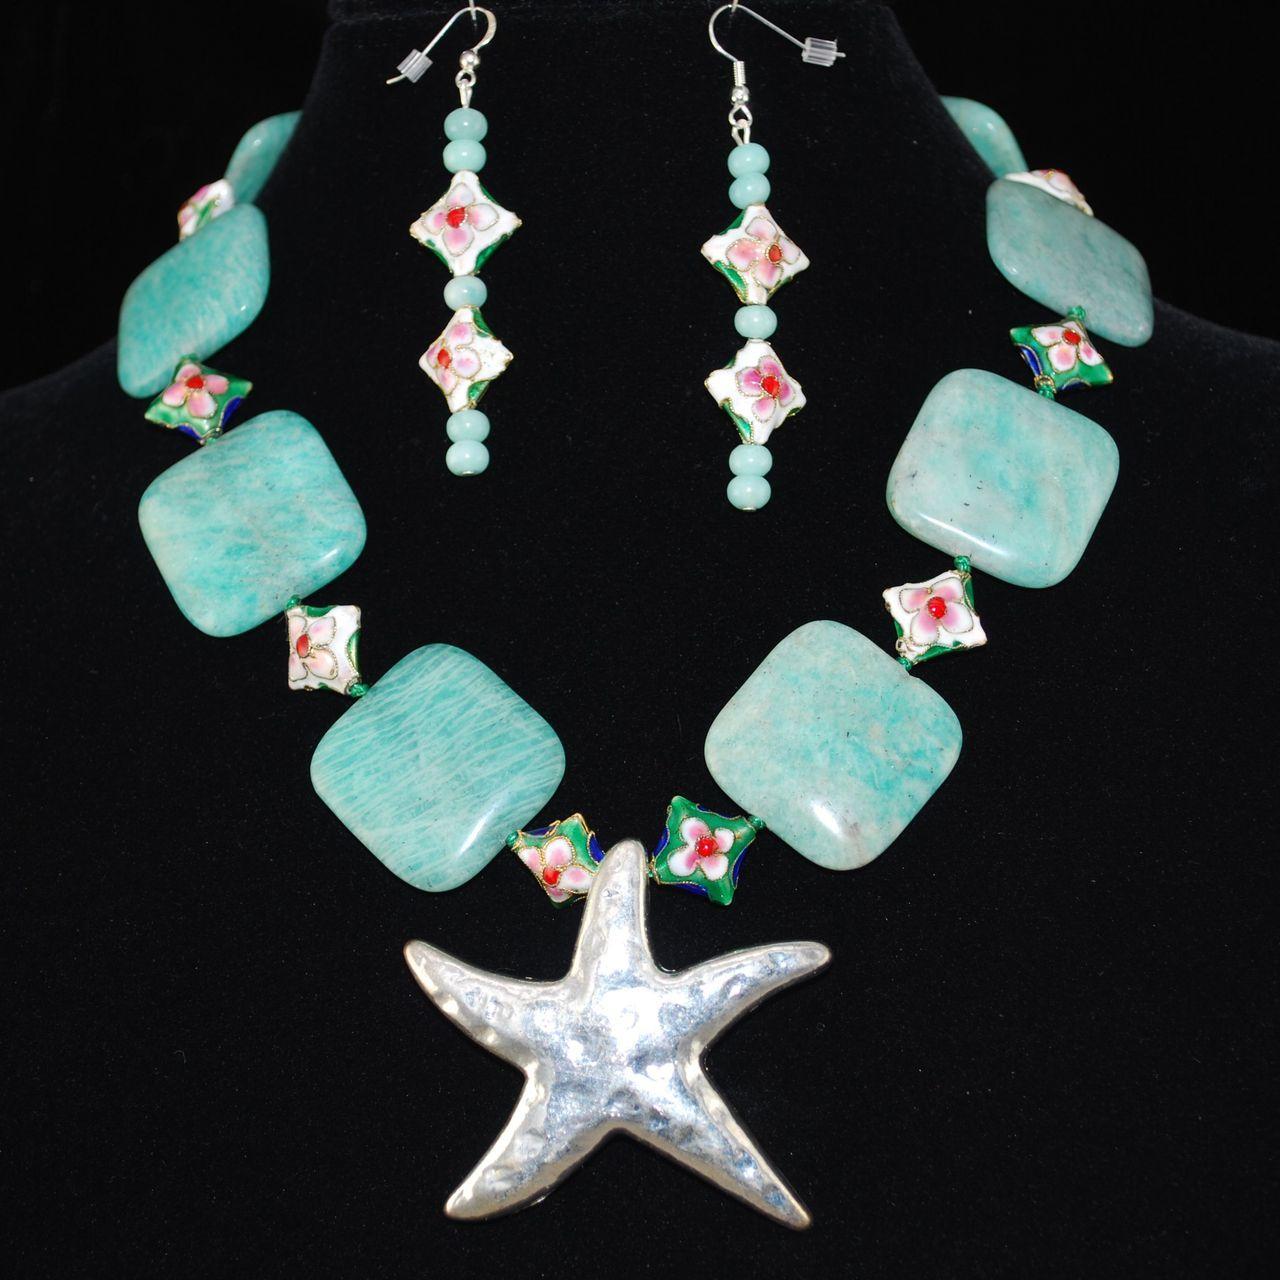 Enchanting Jewelry Creations image 26